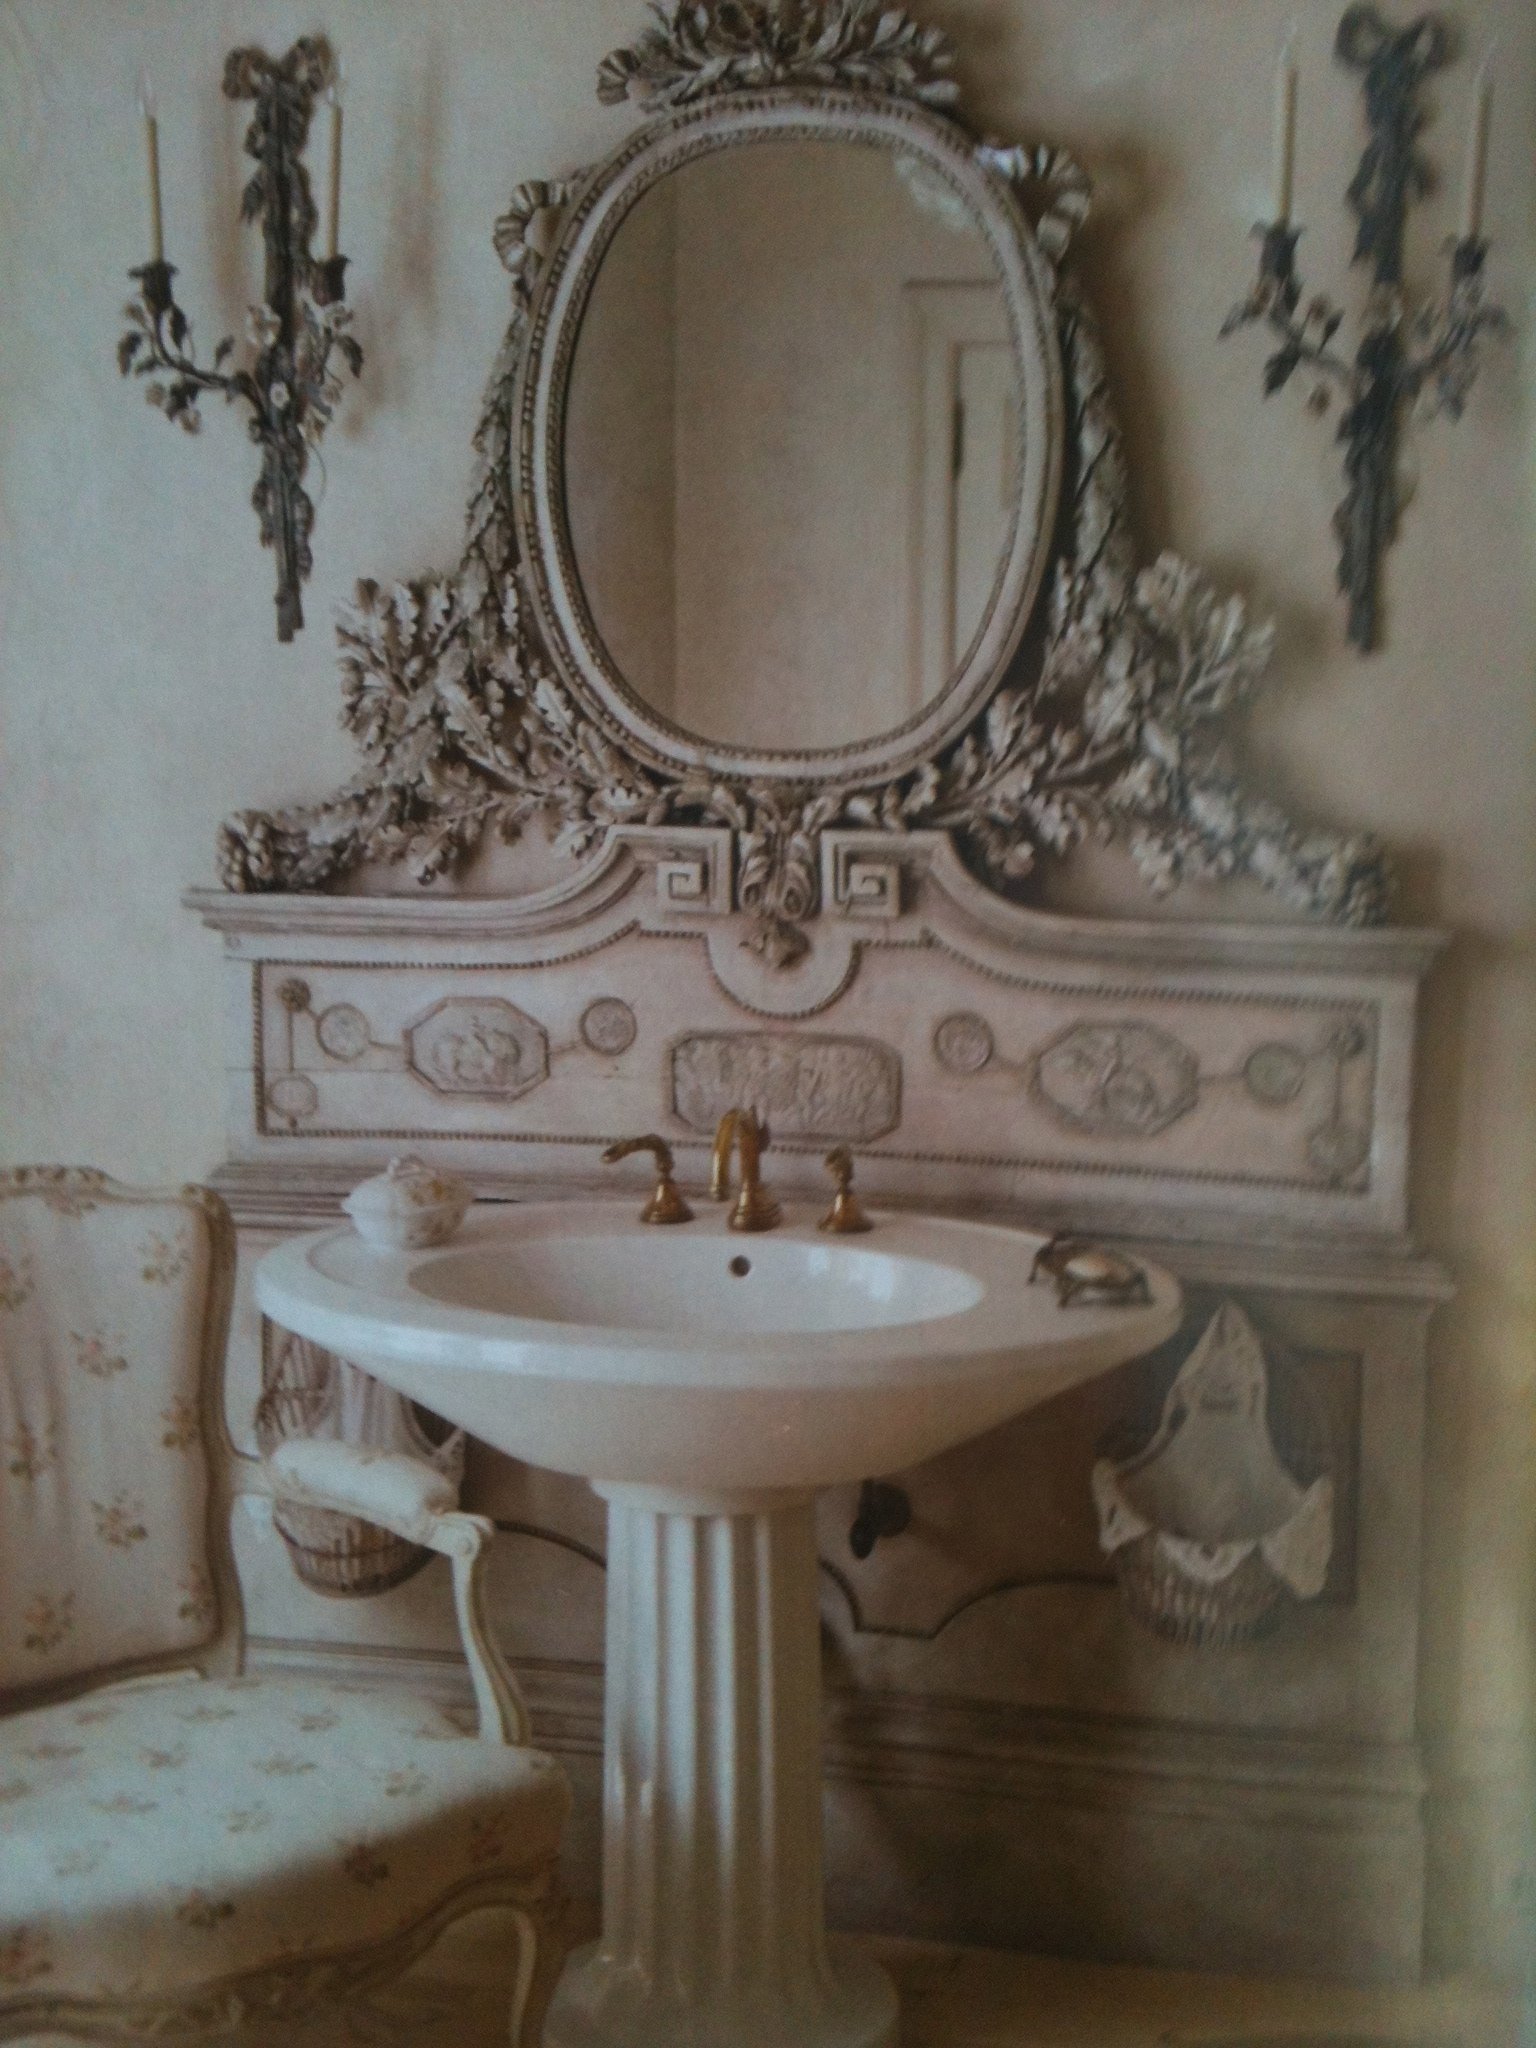 Small Bathroom Cheap Subway Tile Subway Tile Backsplash Regarding Shabby Chic Mirrors Cheap (View 15 of 15)